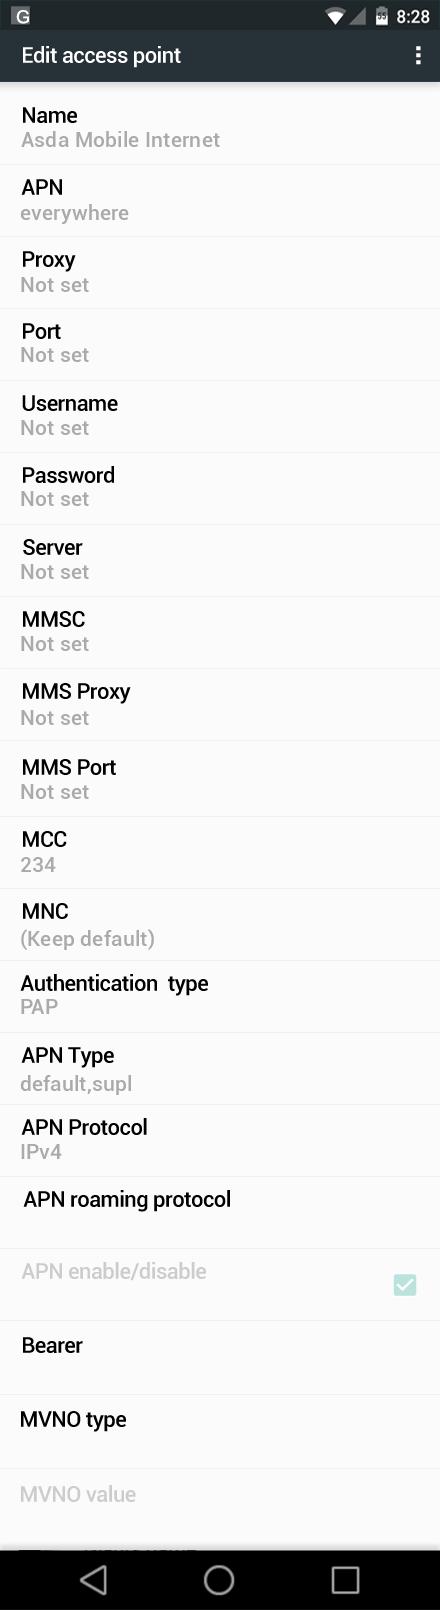 Asda Mobile Internet APN settings for Android Marshmallow screenshot